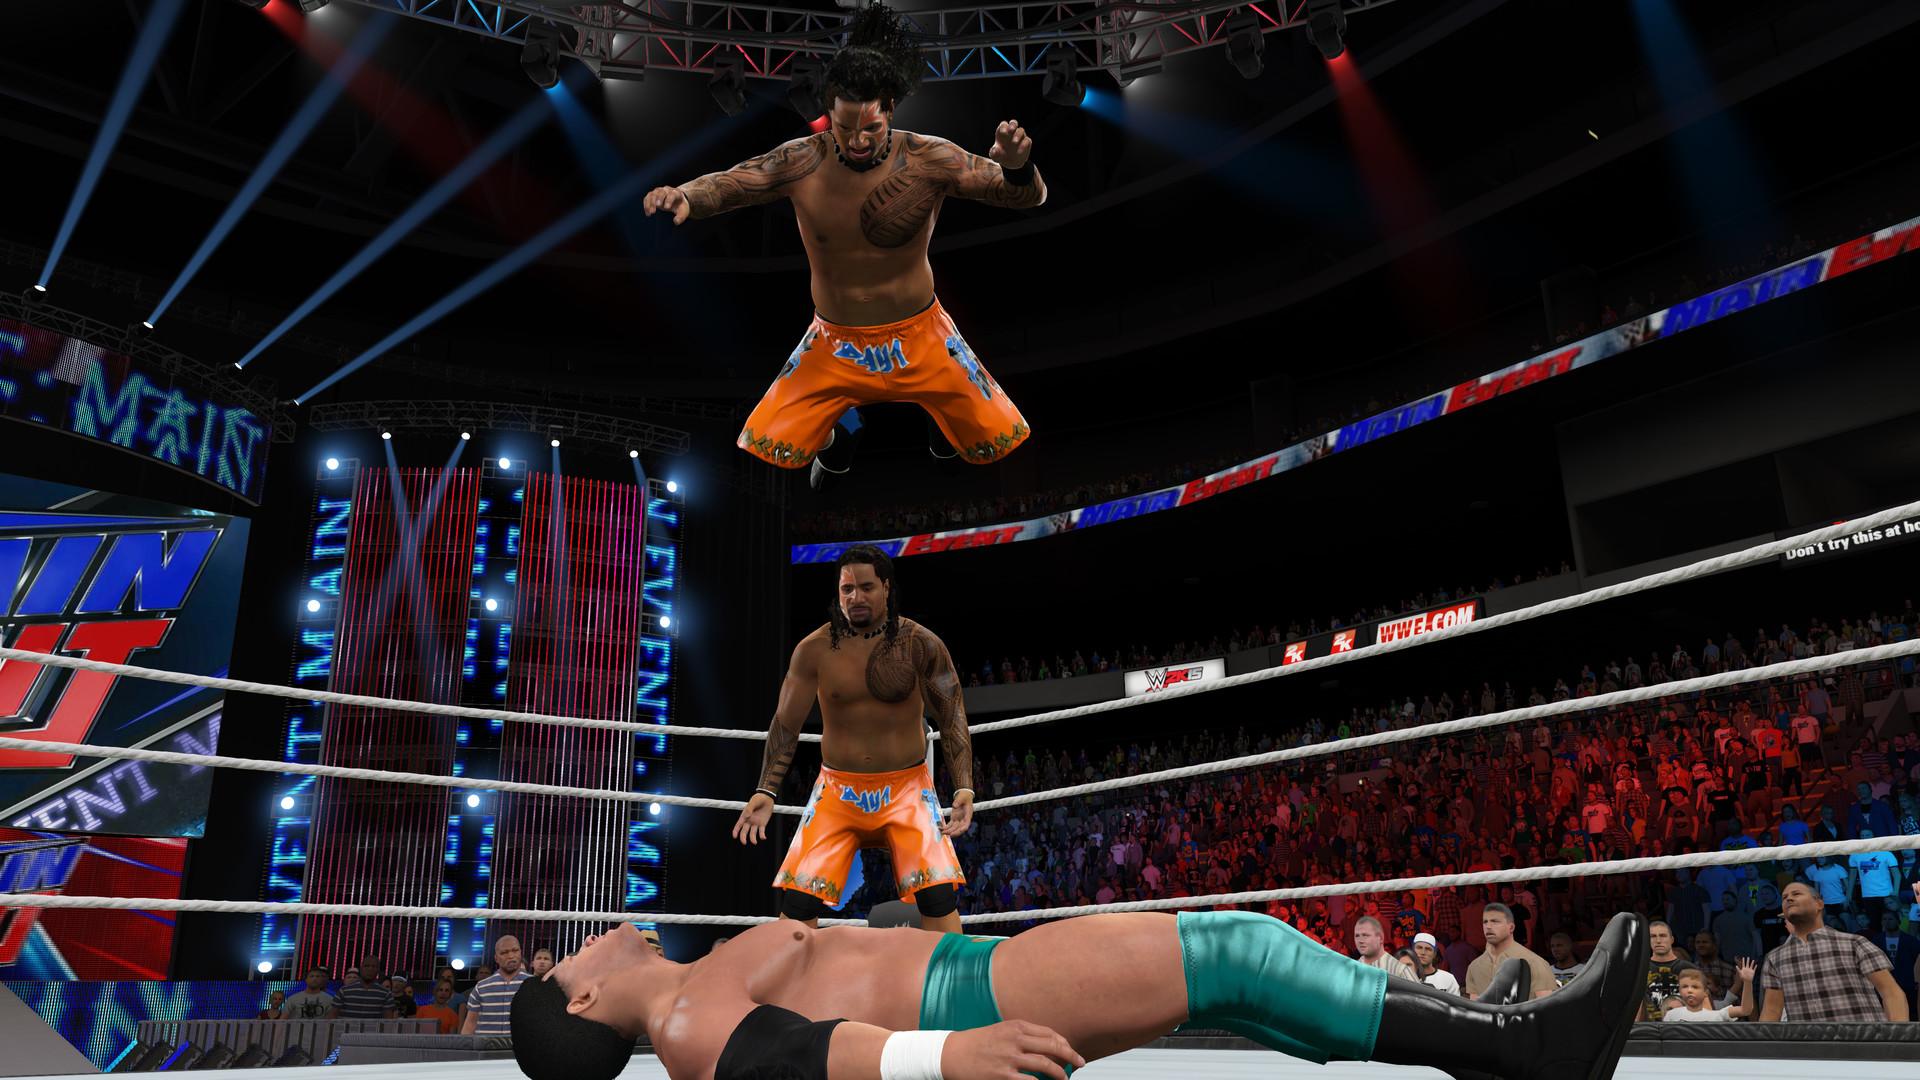 WWE 2K15 ESPAÑOL Full PC + DLC Pack Addon (RELOADED) + REPACK 5 DVD5 (JPW) 9